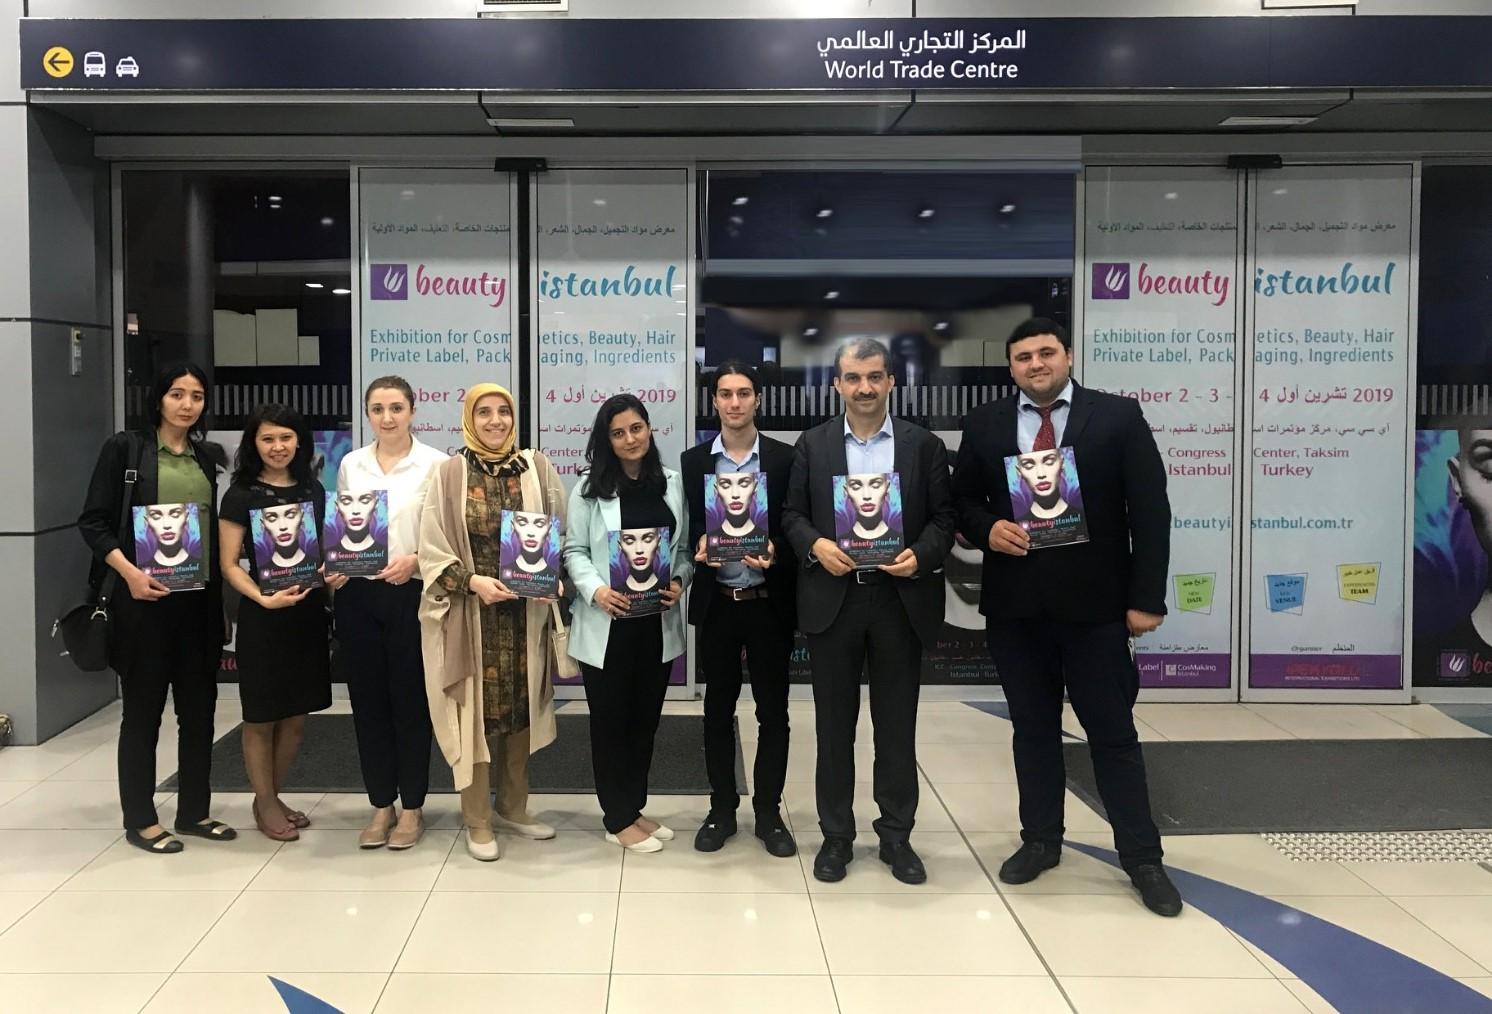 Dubai Metro Advertisement Dubai-United Arab Emirates, May 2018-2